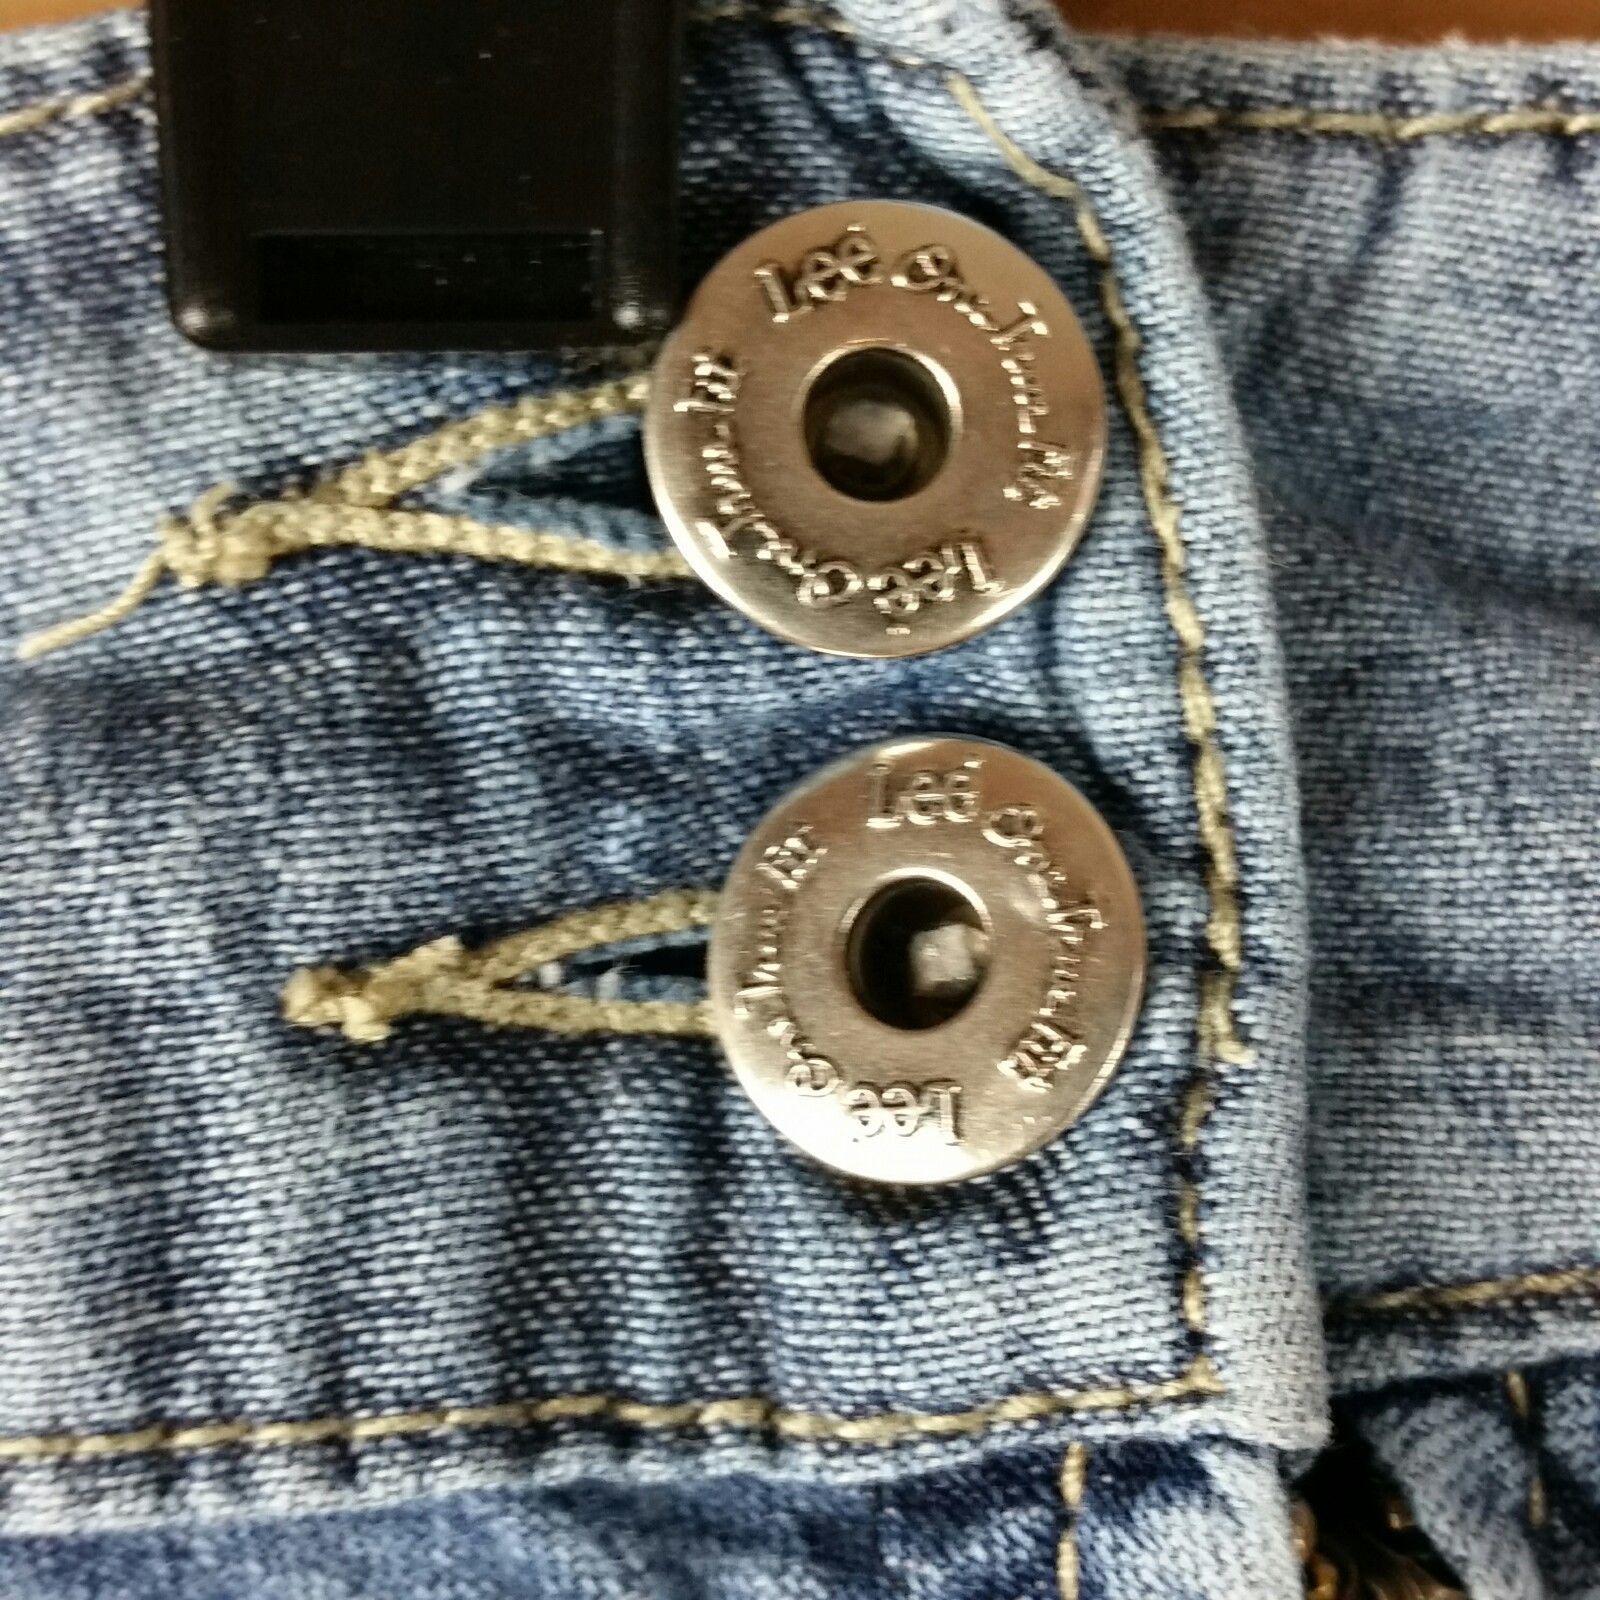 LEE Jean Skirt Womens One True Fit Modest Denim Fringe Hem Size 15/16M image 2